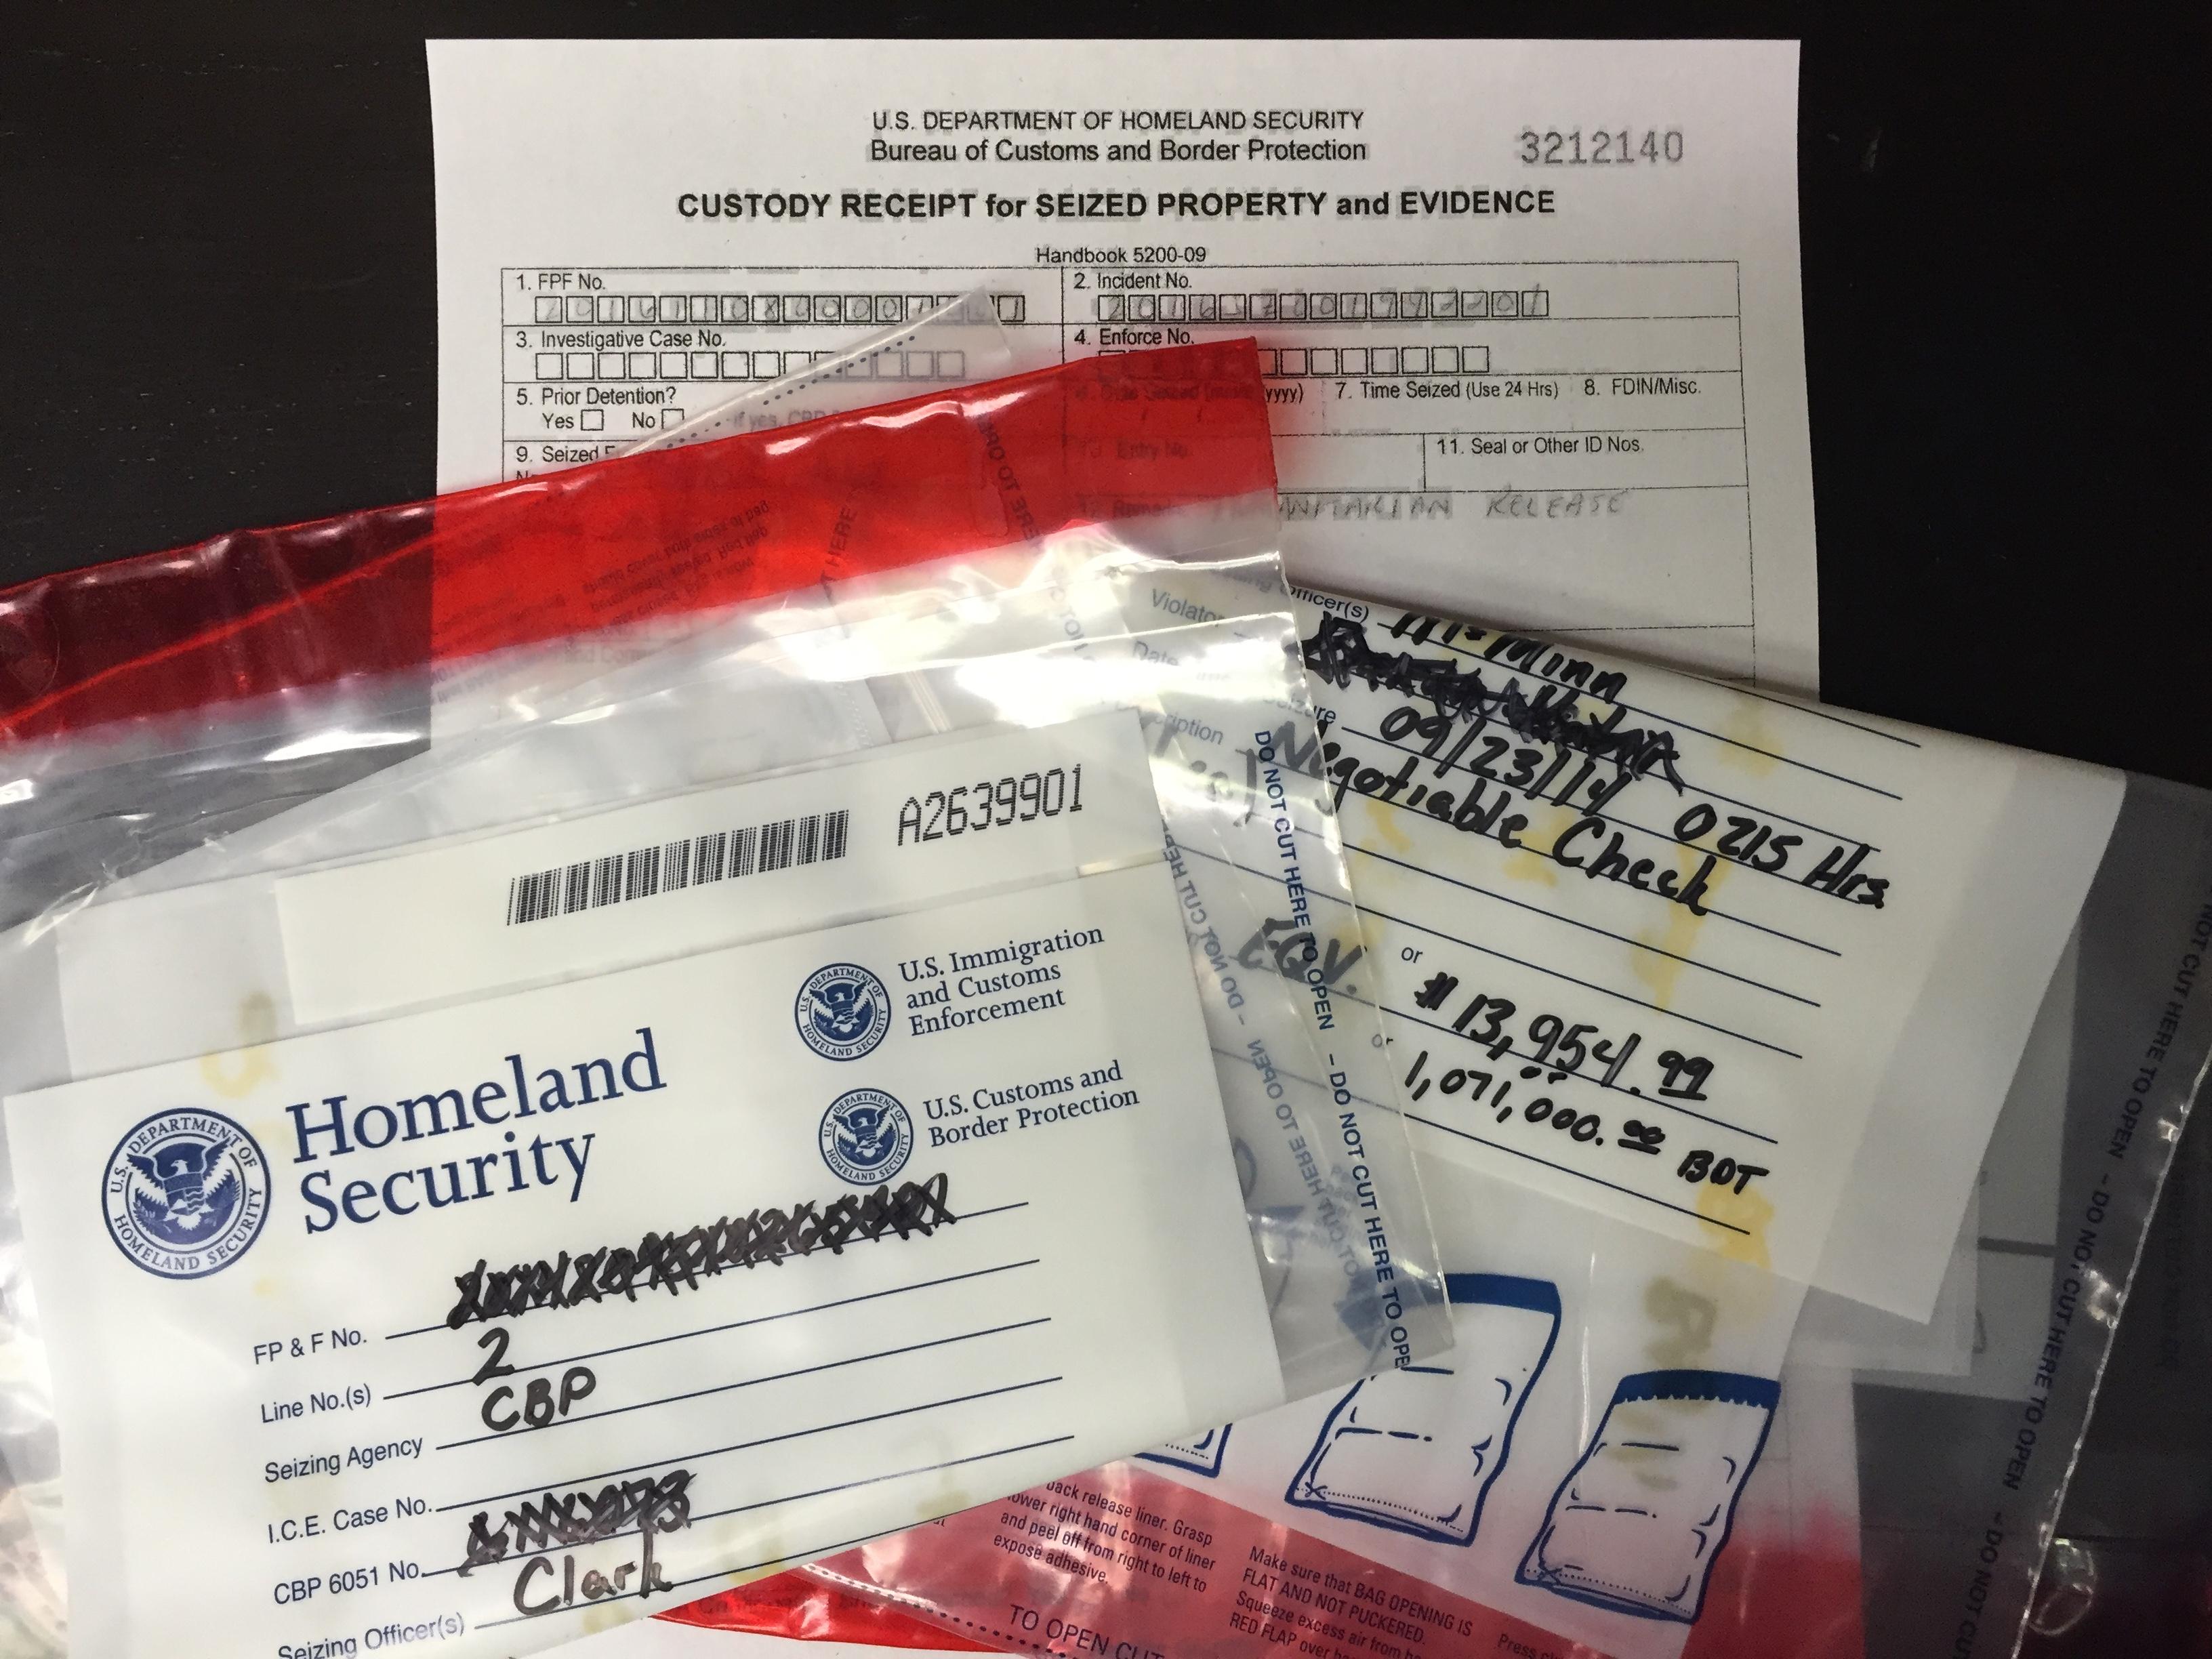 Responding to a Cash Seizure Custody Receipt - Great Lakes